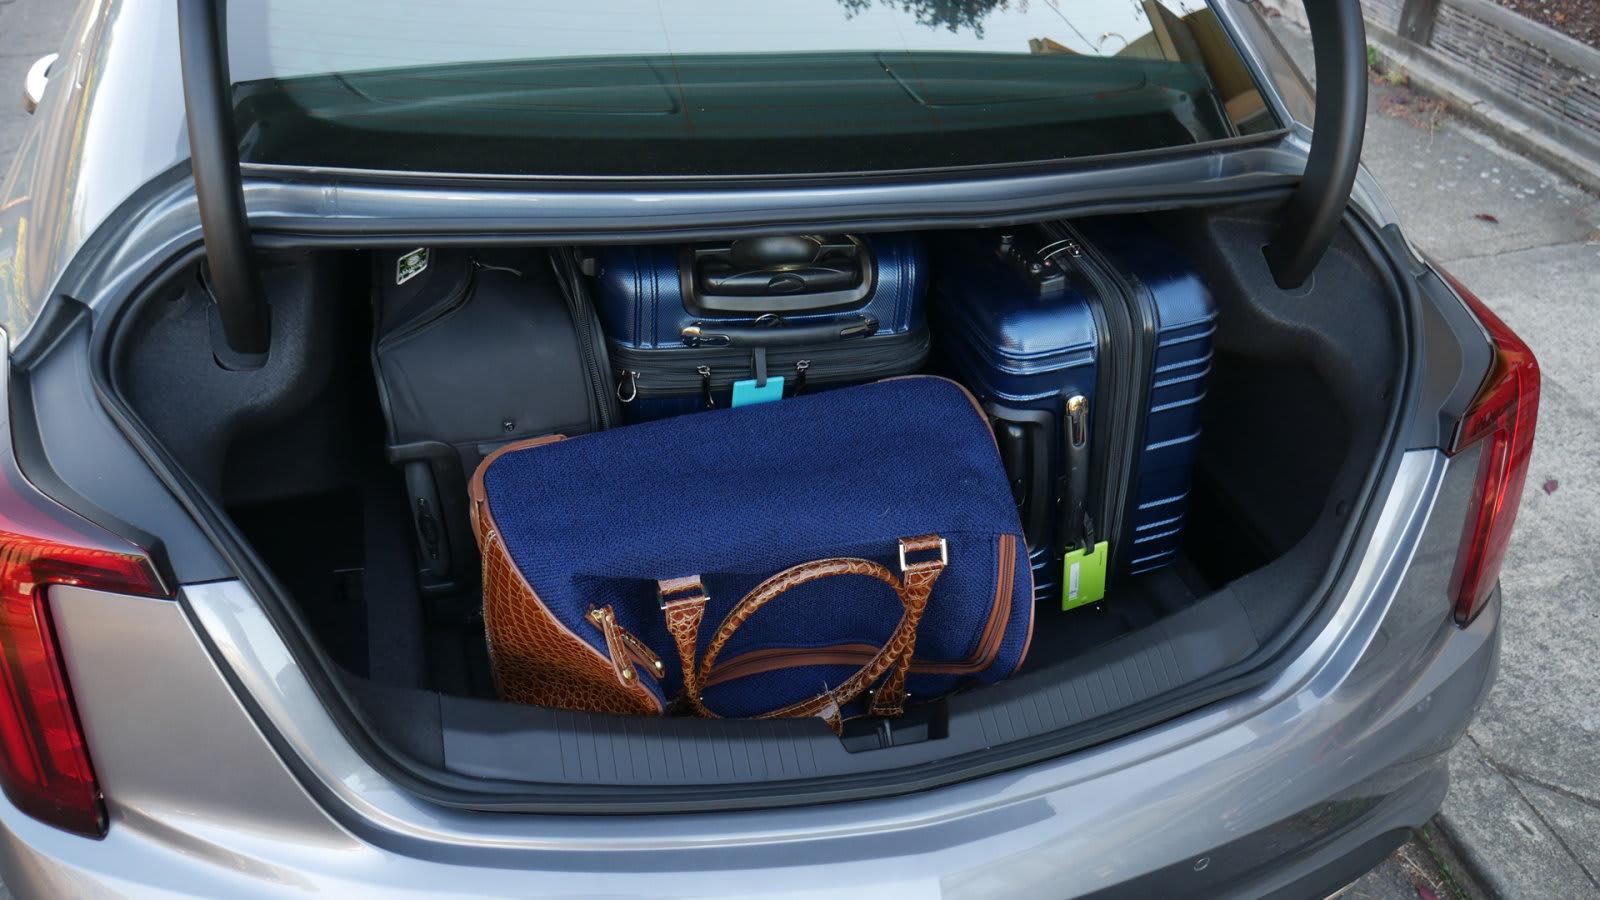 2020 Cadillac CT5 Luggage Test full1